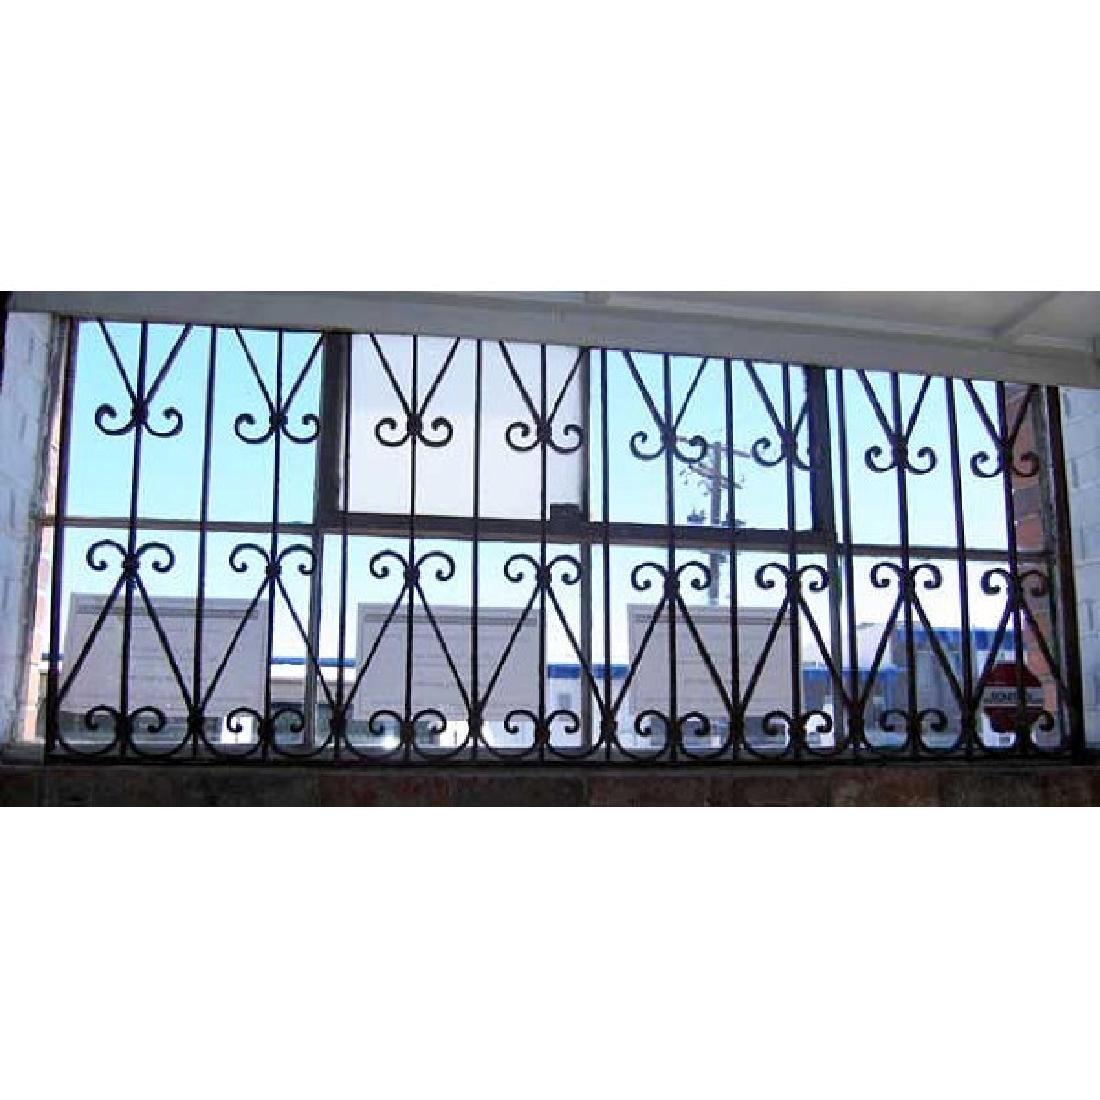 Spanish Wrought Iron Window Grille Panel